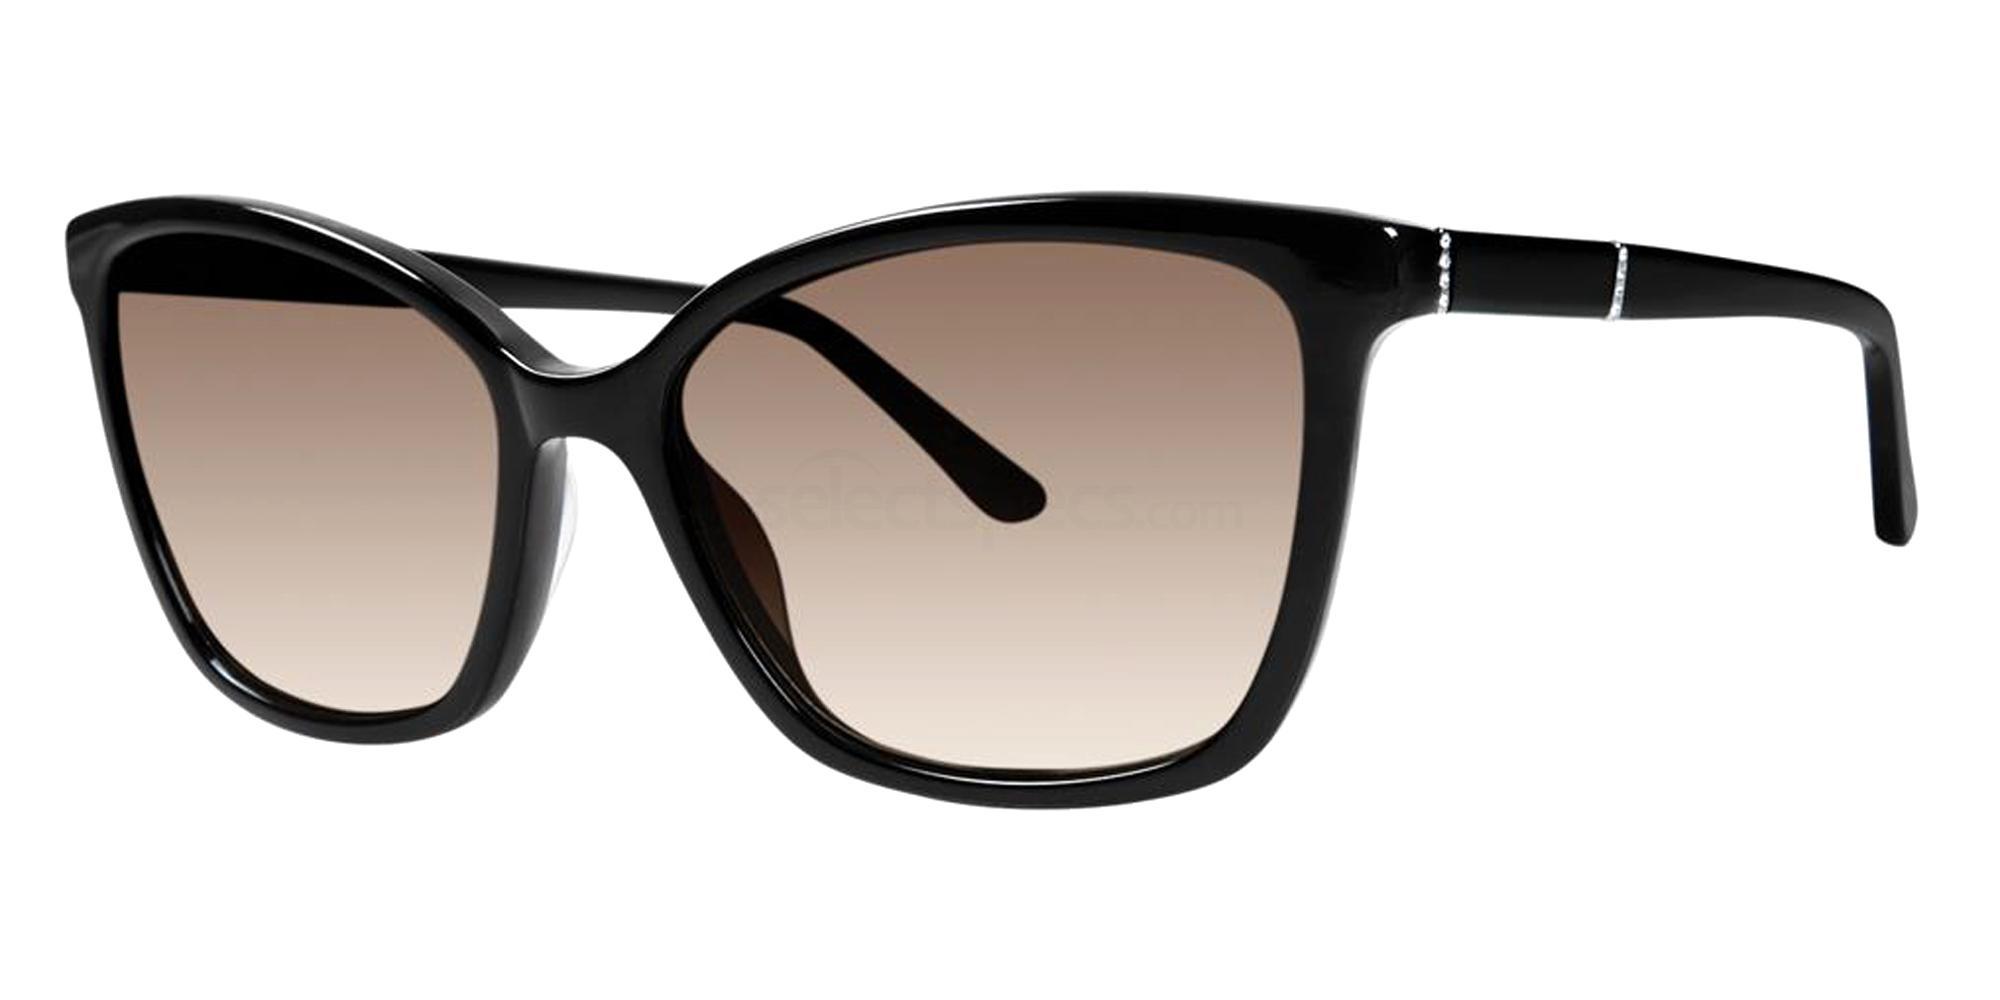 Black ZARINA Sunglasses, Vera Wang Luxe